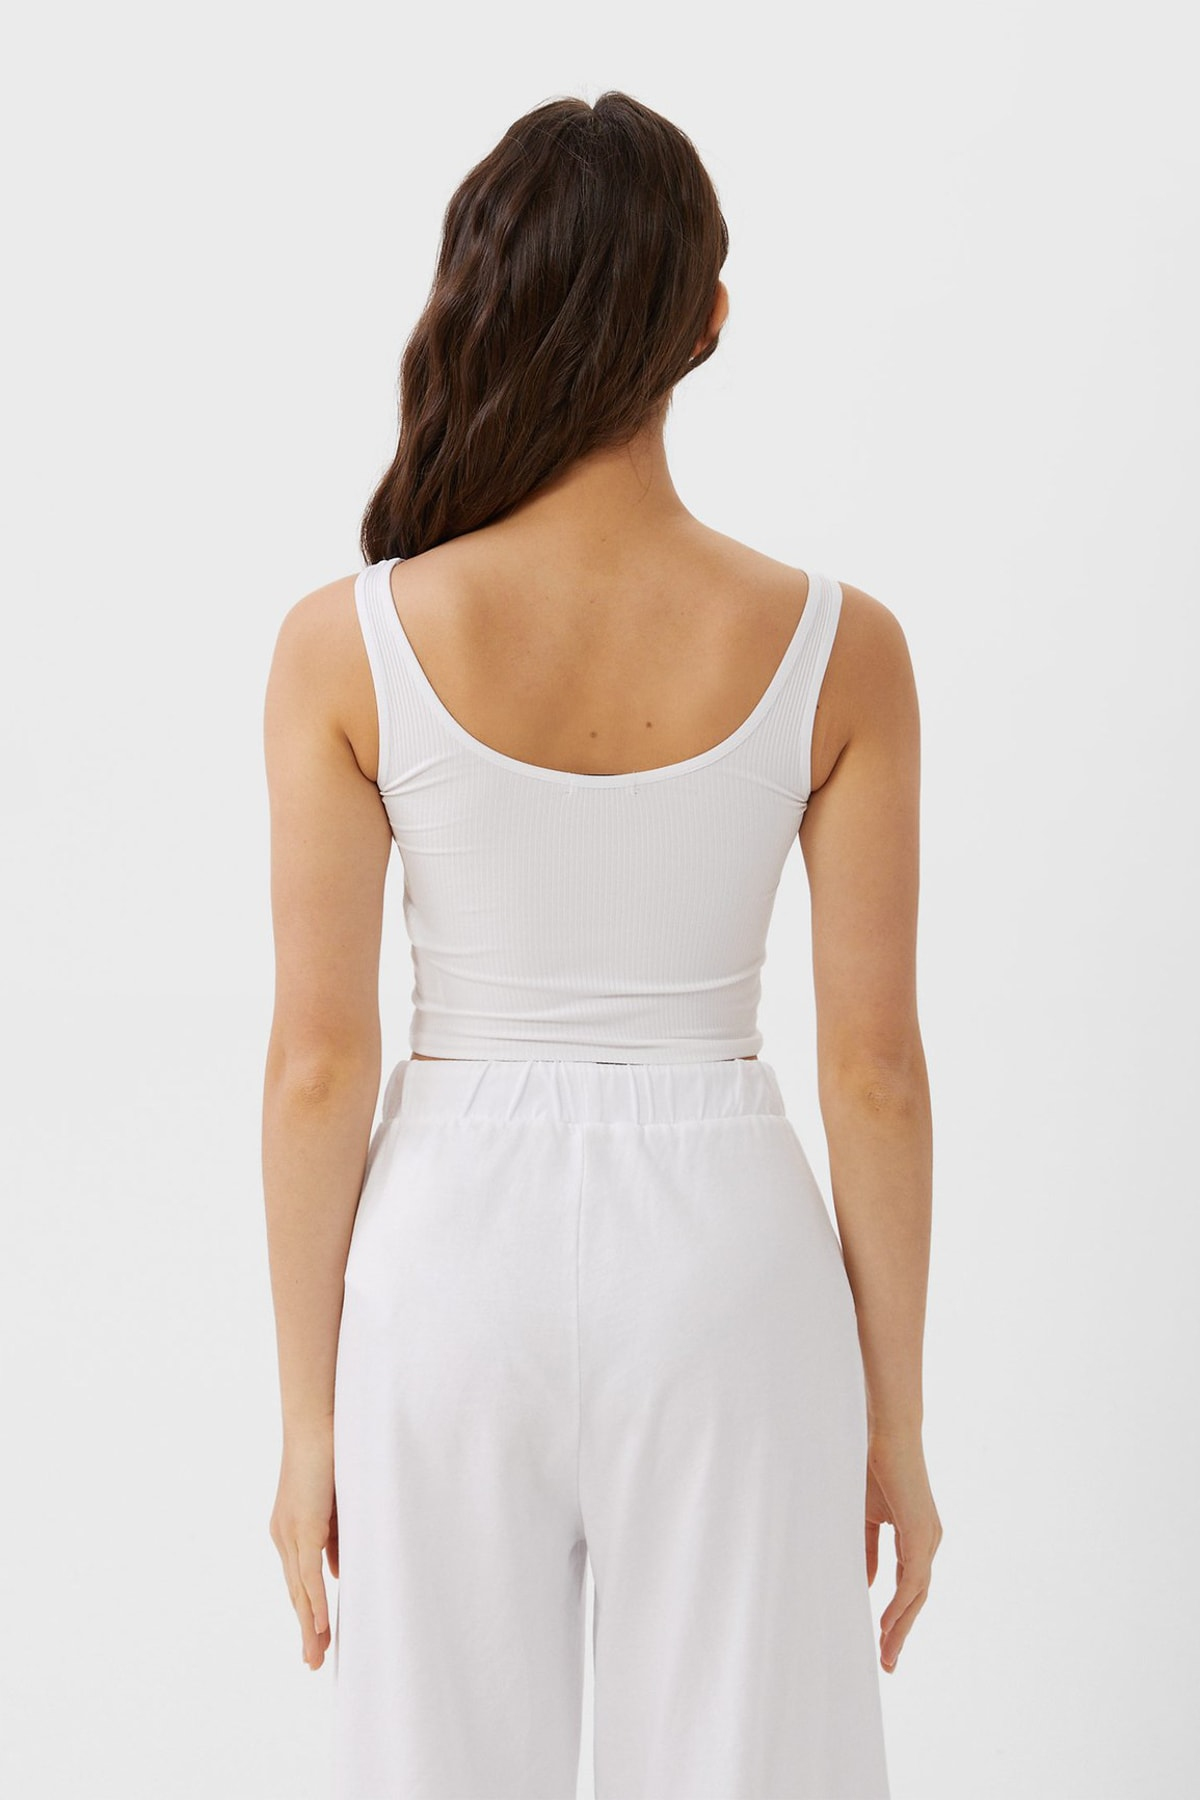 Stradivarius Kadın Beyaz Crop Fit Kolsuz T-Shirt 02517784 2